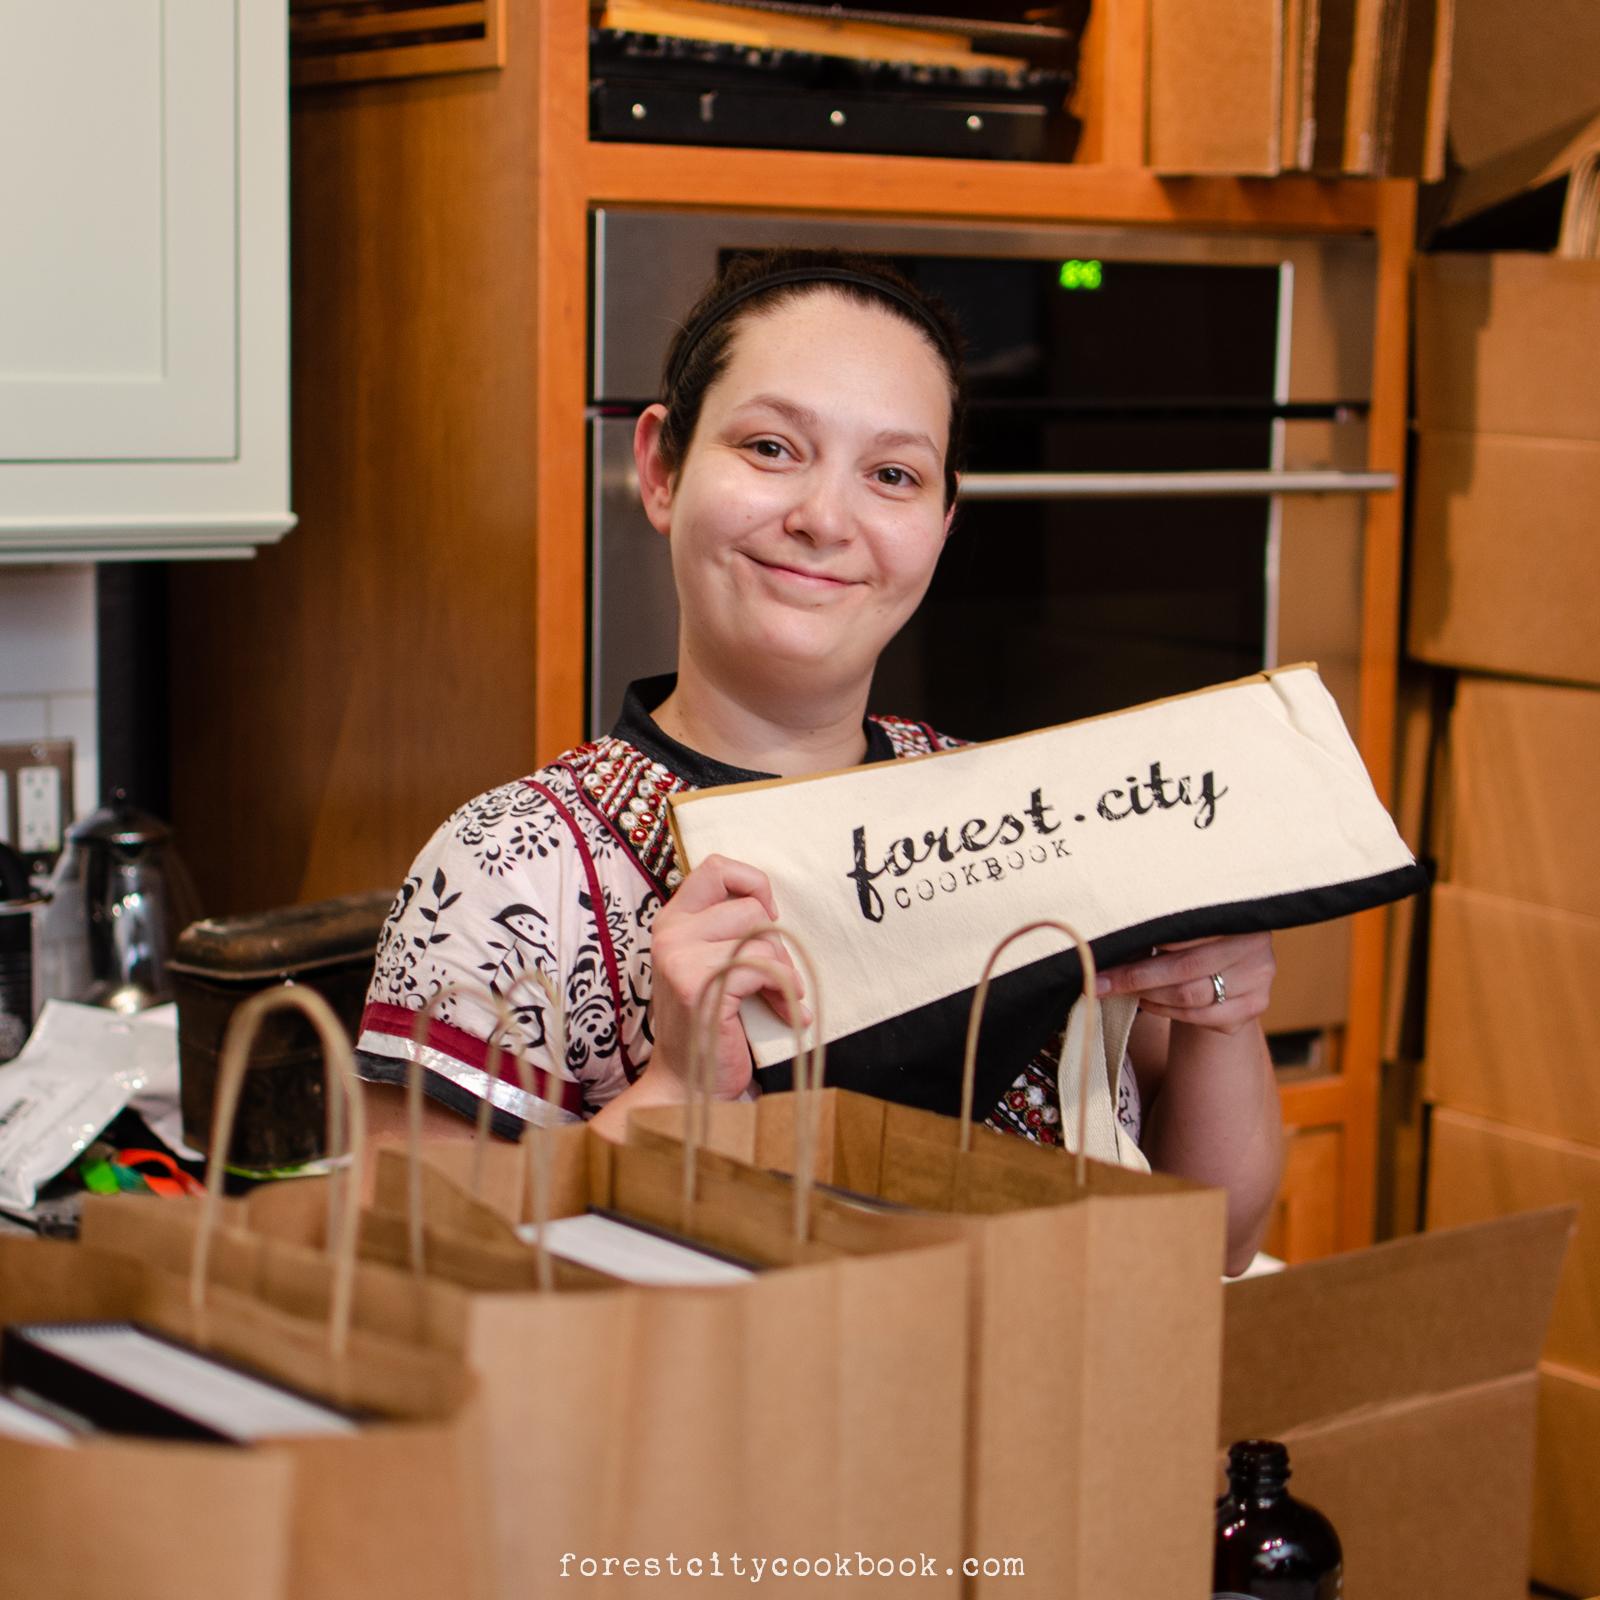 Forest City Cookbook - London Ontario-0309.jpg